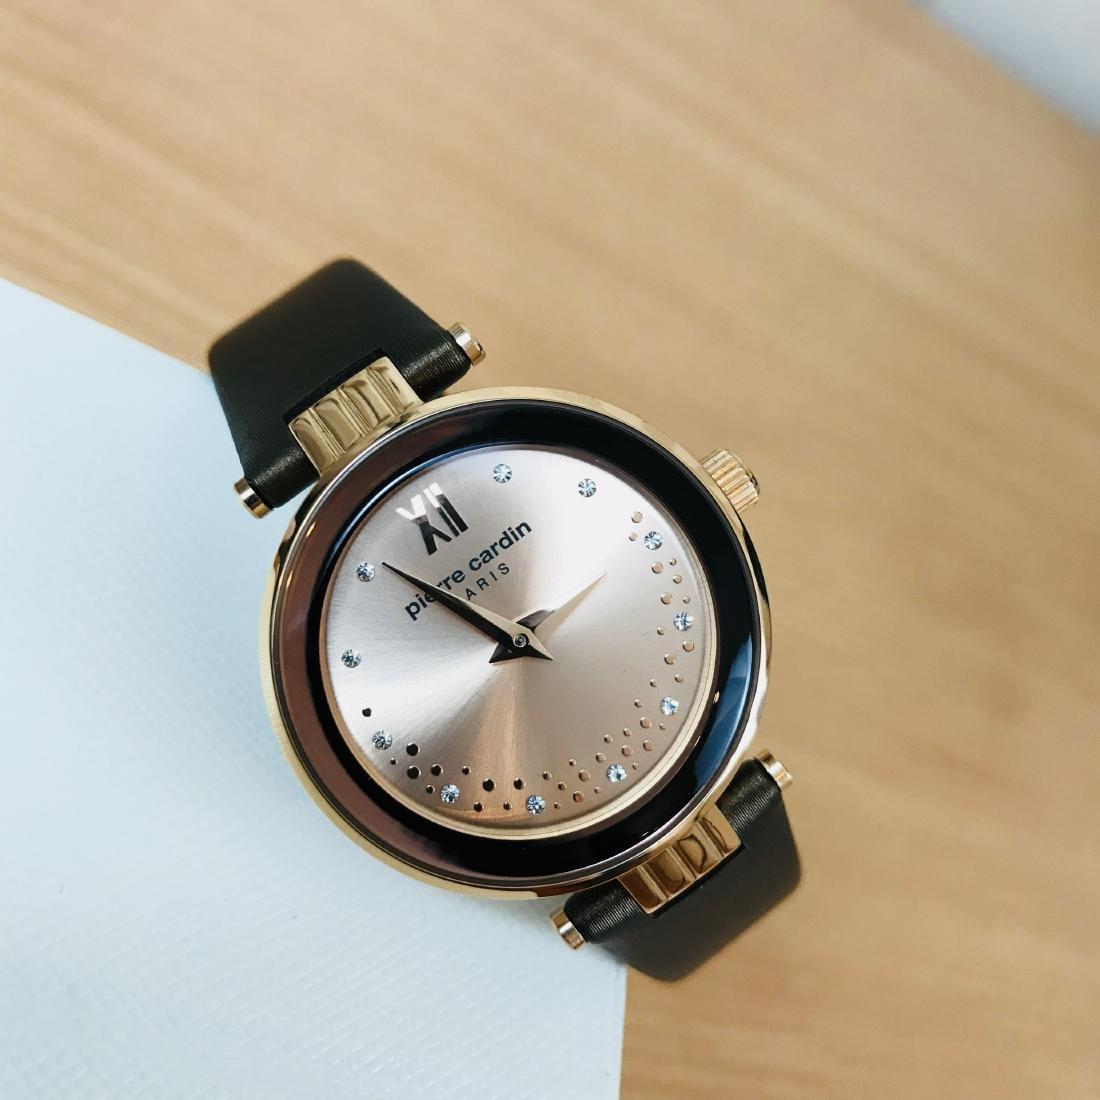 Pierre Cardin – Ladies Classic Watch